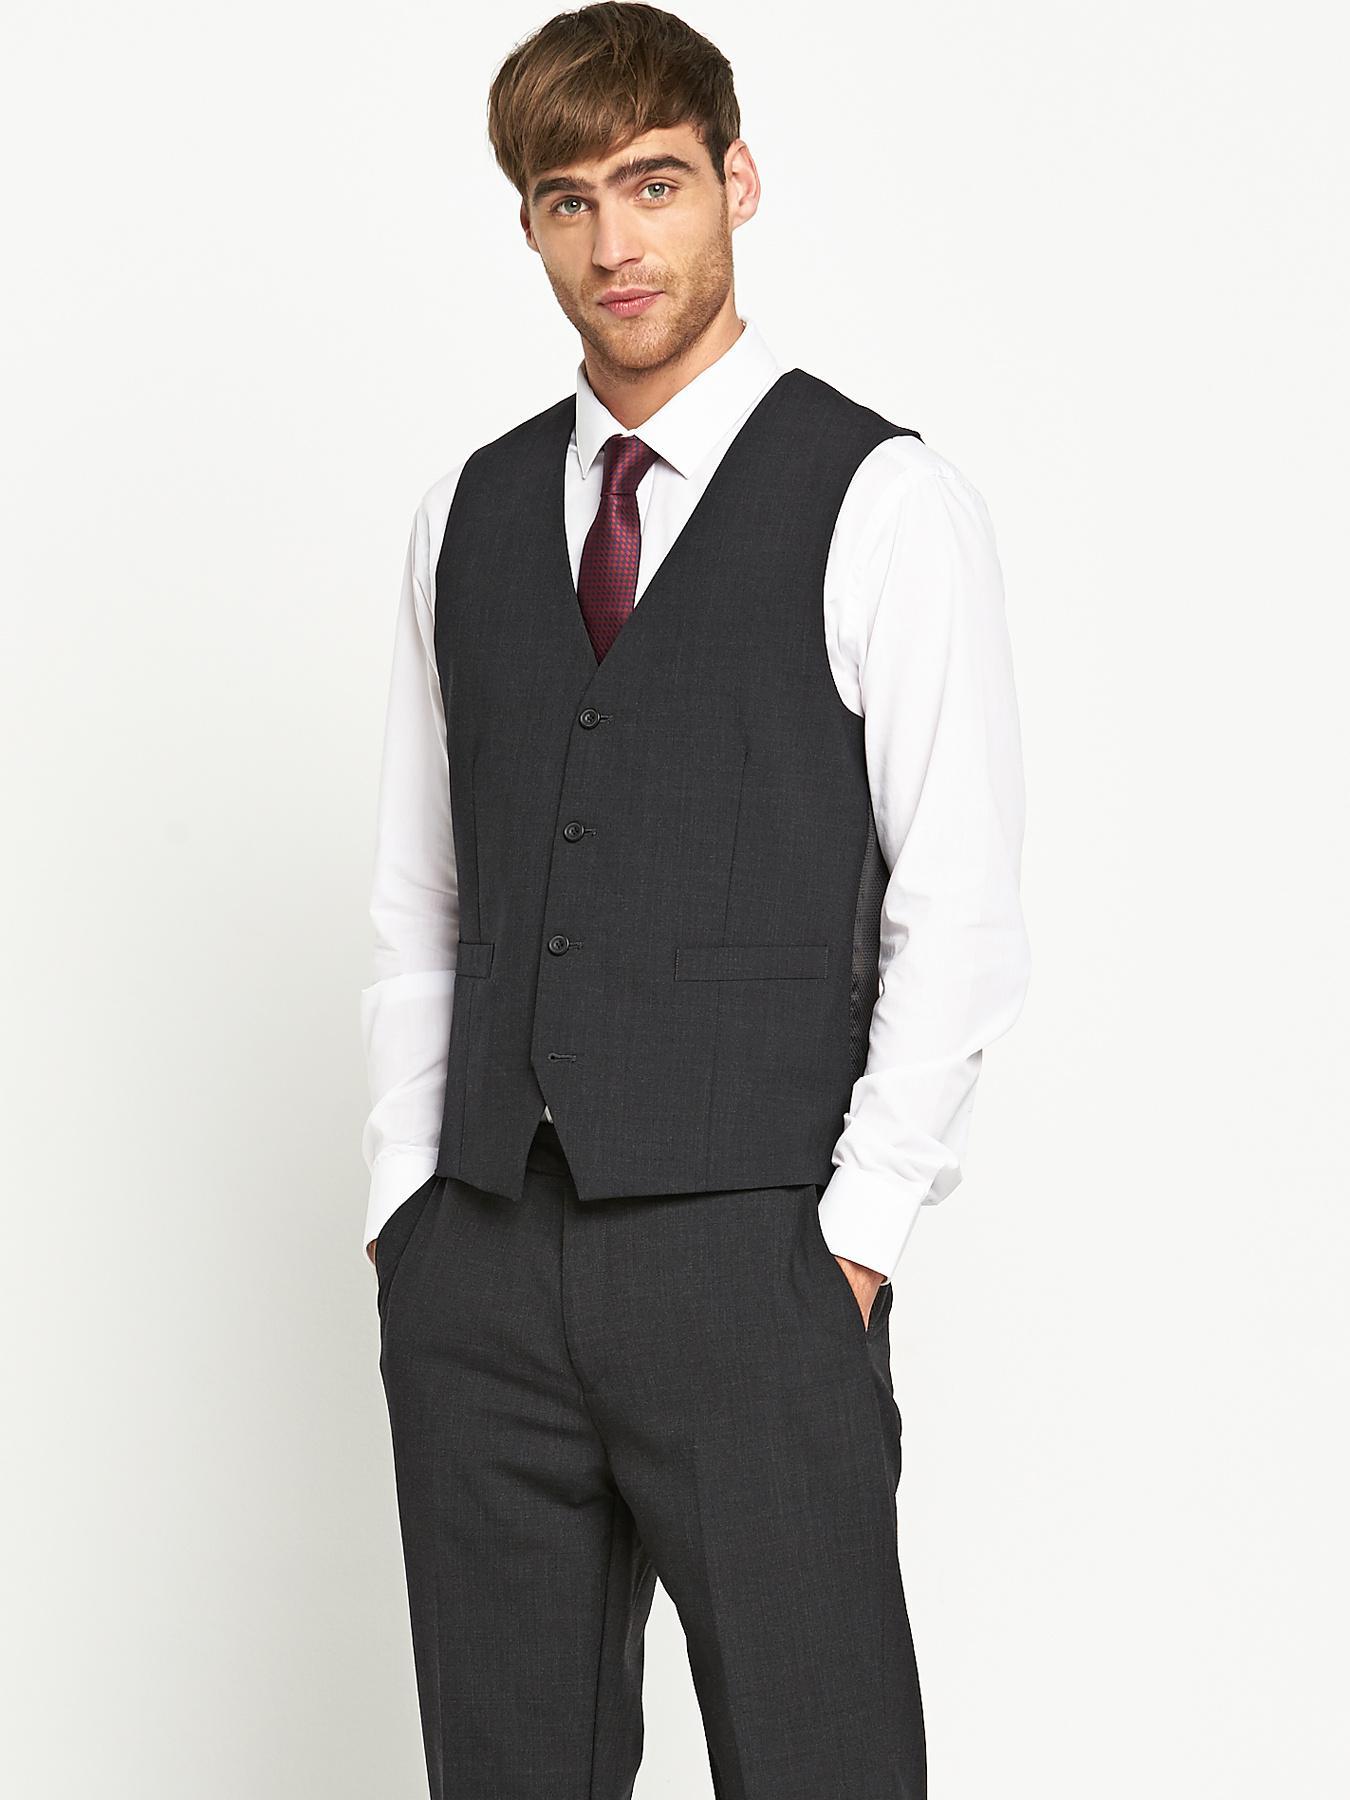 Mens Otis Suit Waistcoat - Charcoal, Charcoal